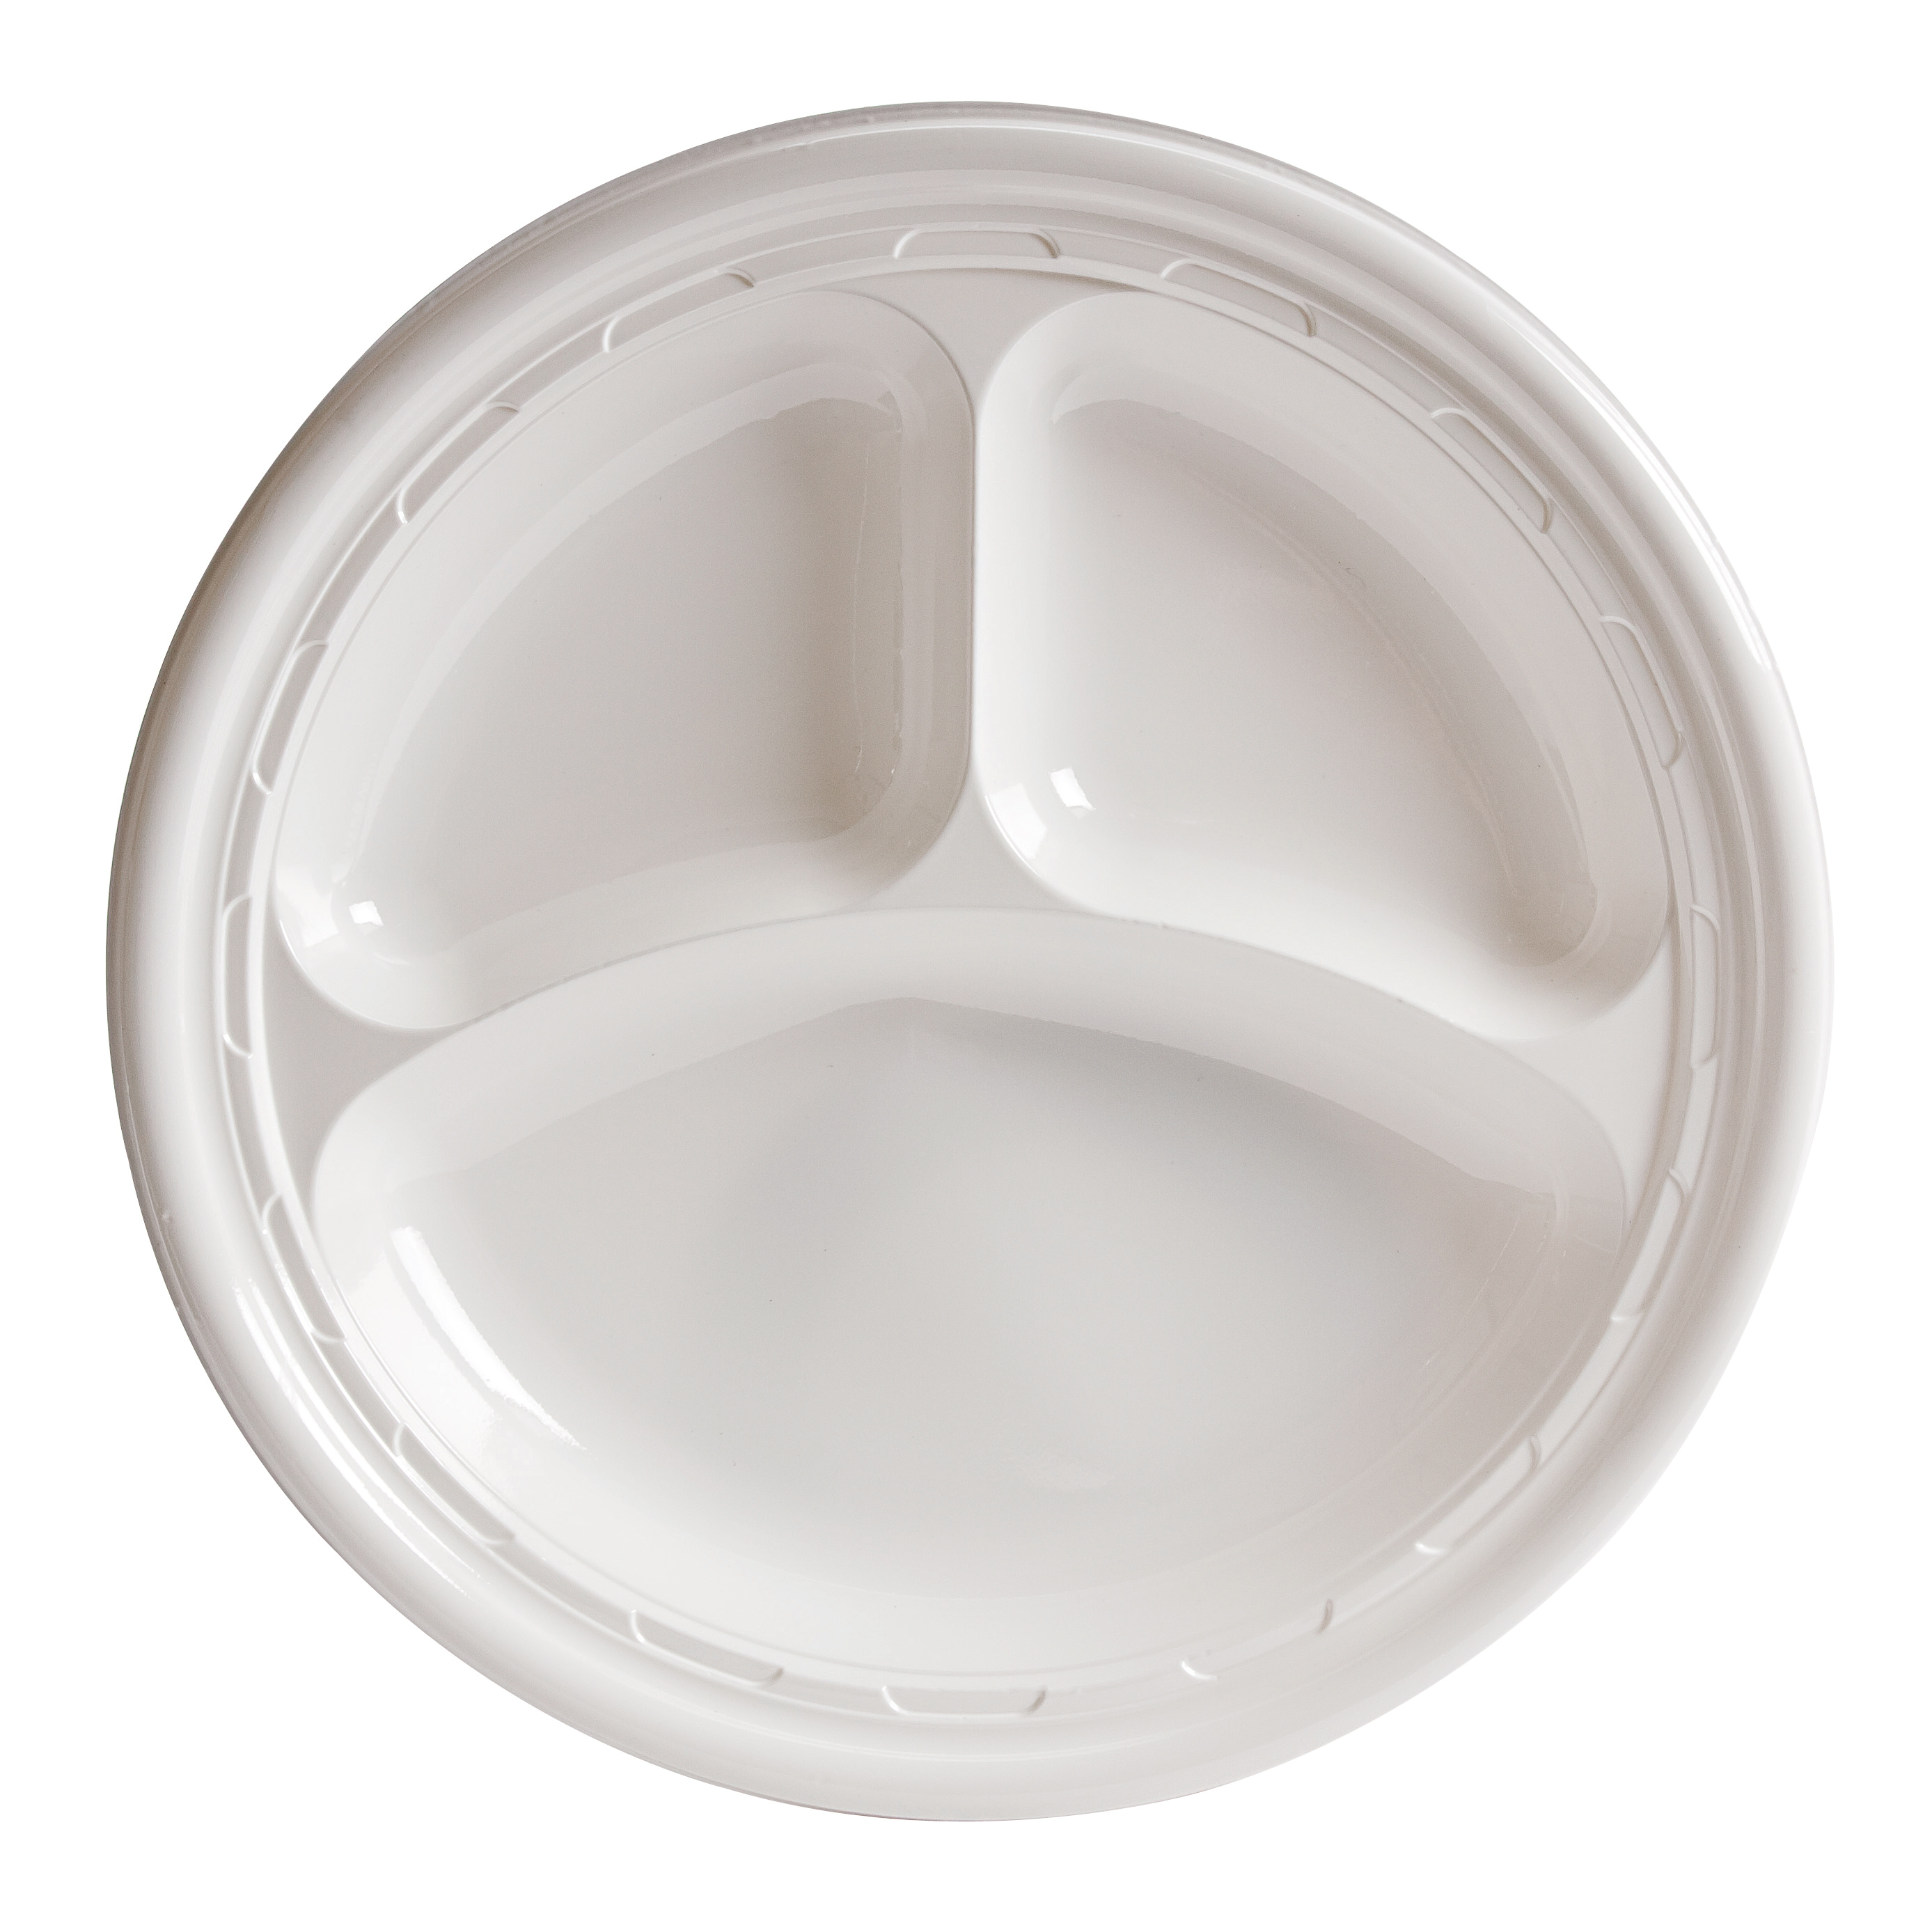 "Dart 3-sect Disposable Plastic Dinnerware Plate - 10"" Diameter Dinner Plate - Plastic - Disposable - White - 500 Piece(s) / Carton"